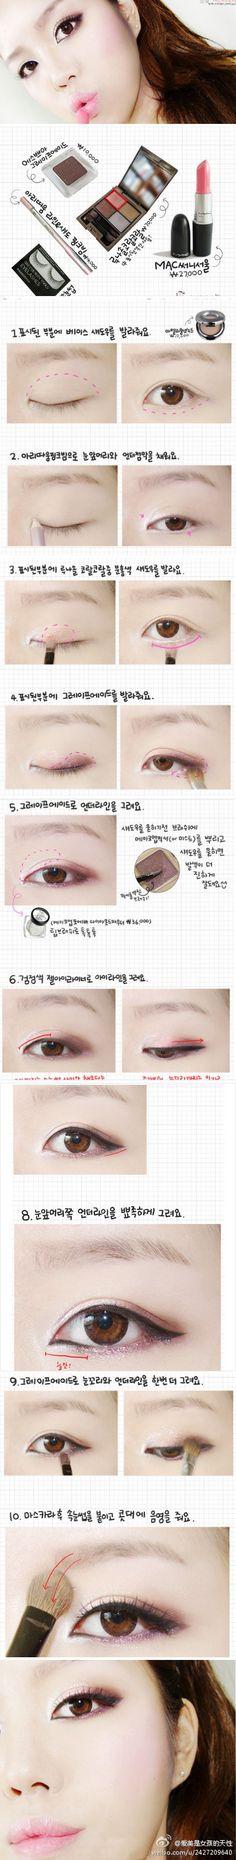 Asian eyes make up.because my eyes are ya know. Asian Makeup Looks, Korean Makeup Look, Asian Eye Makeup, Plum Makeup, Makeup Haul, Beauty Makeup, Makeup Tips, Makeup Style, Beauty Care